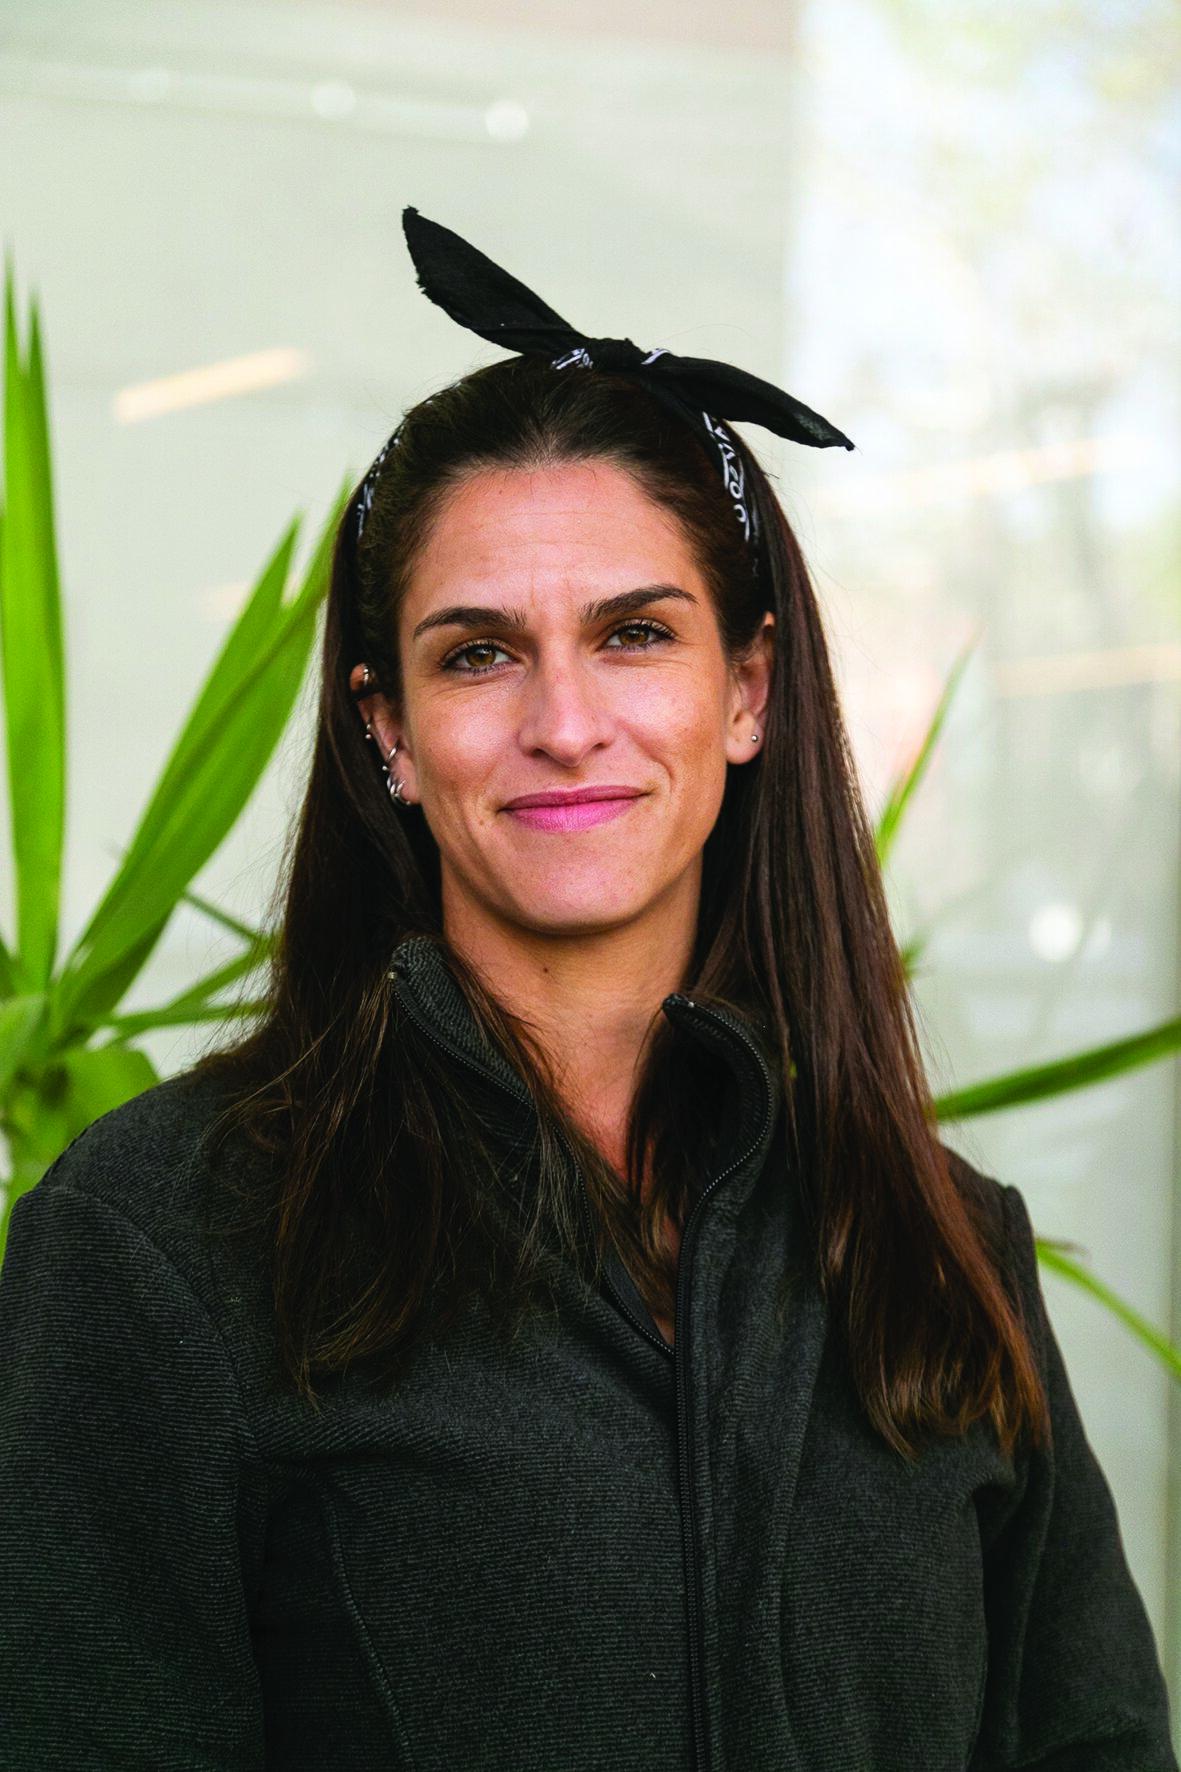 Catalina Moreno